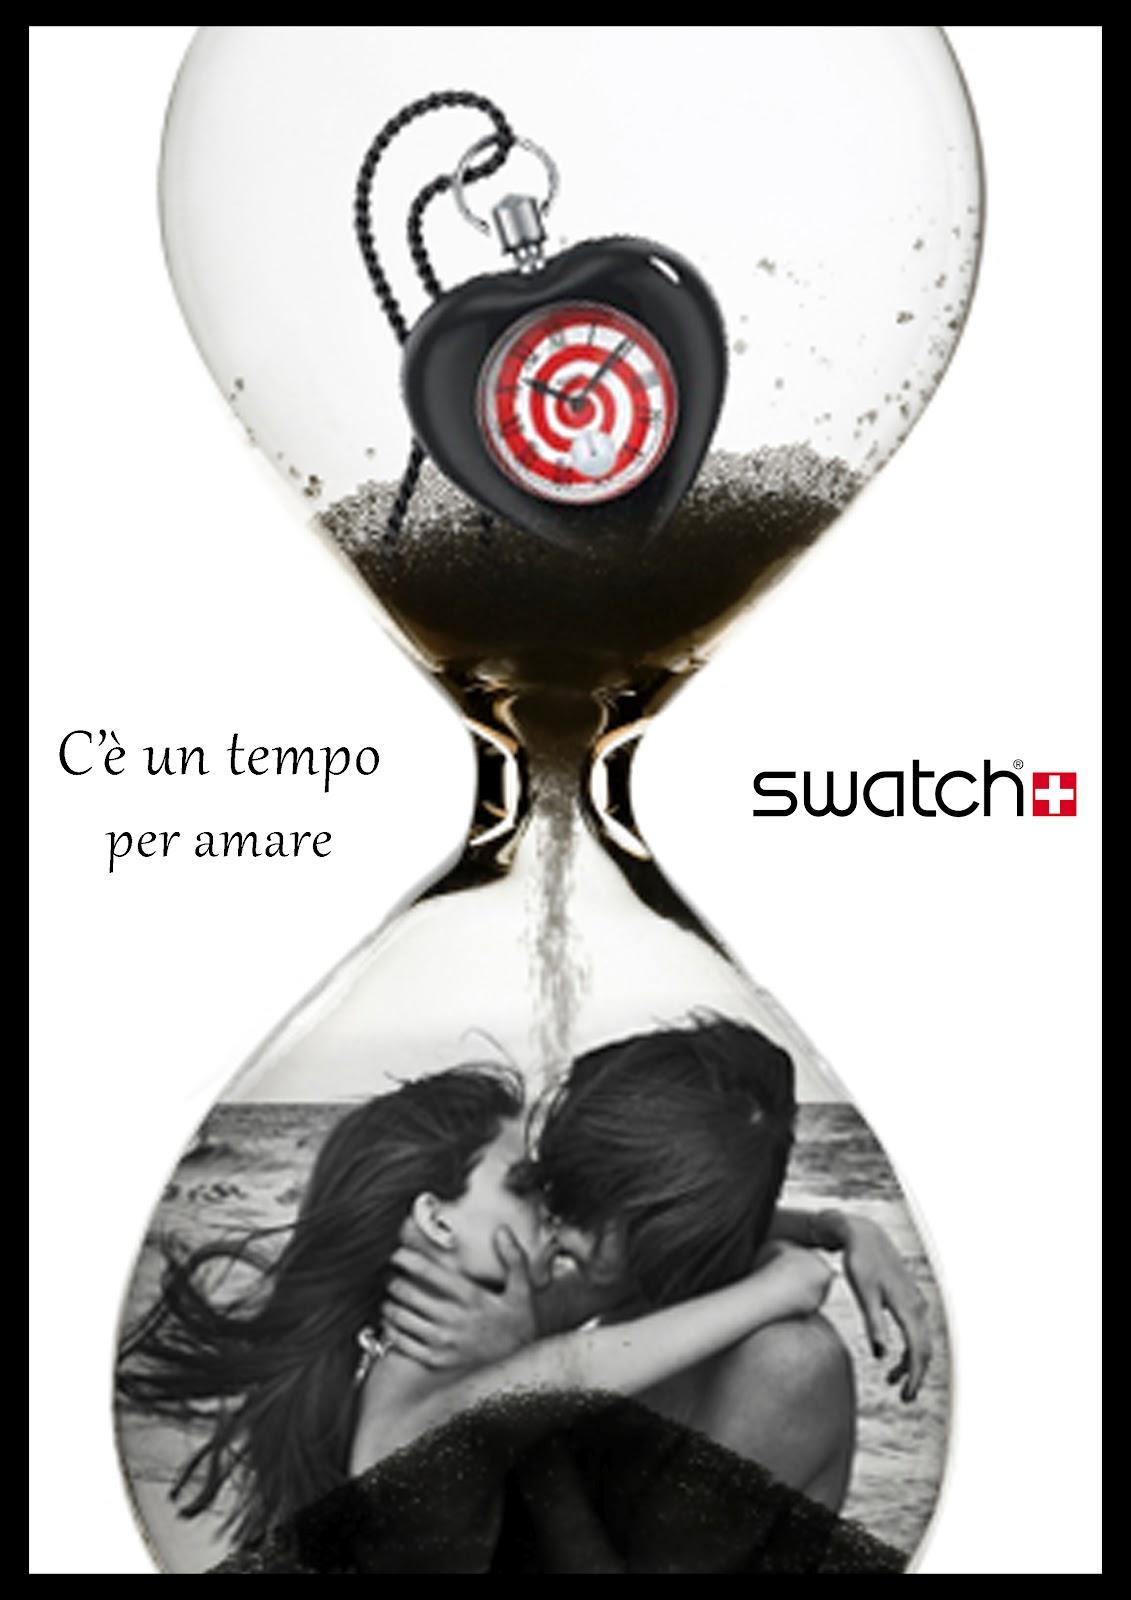 pubblicità+swatch